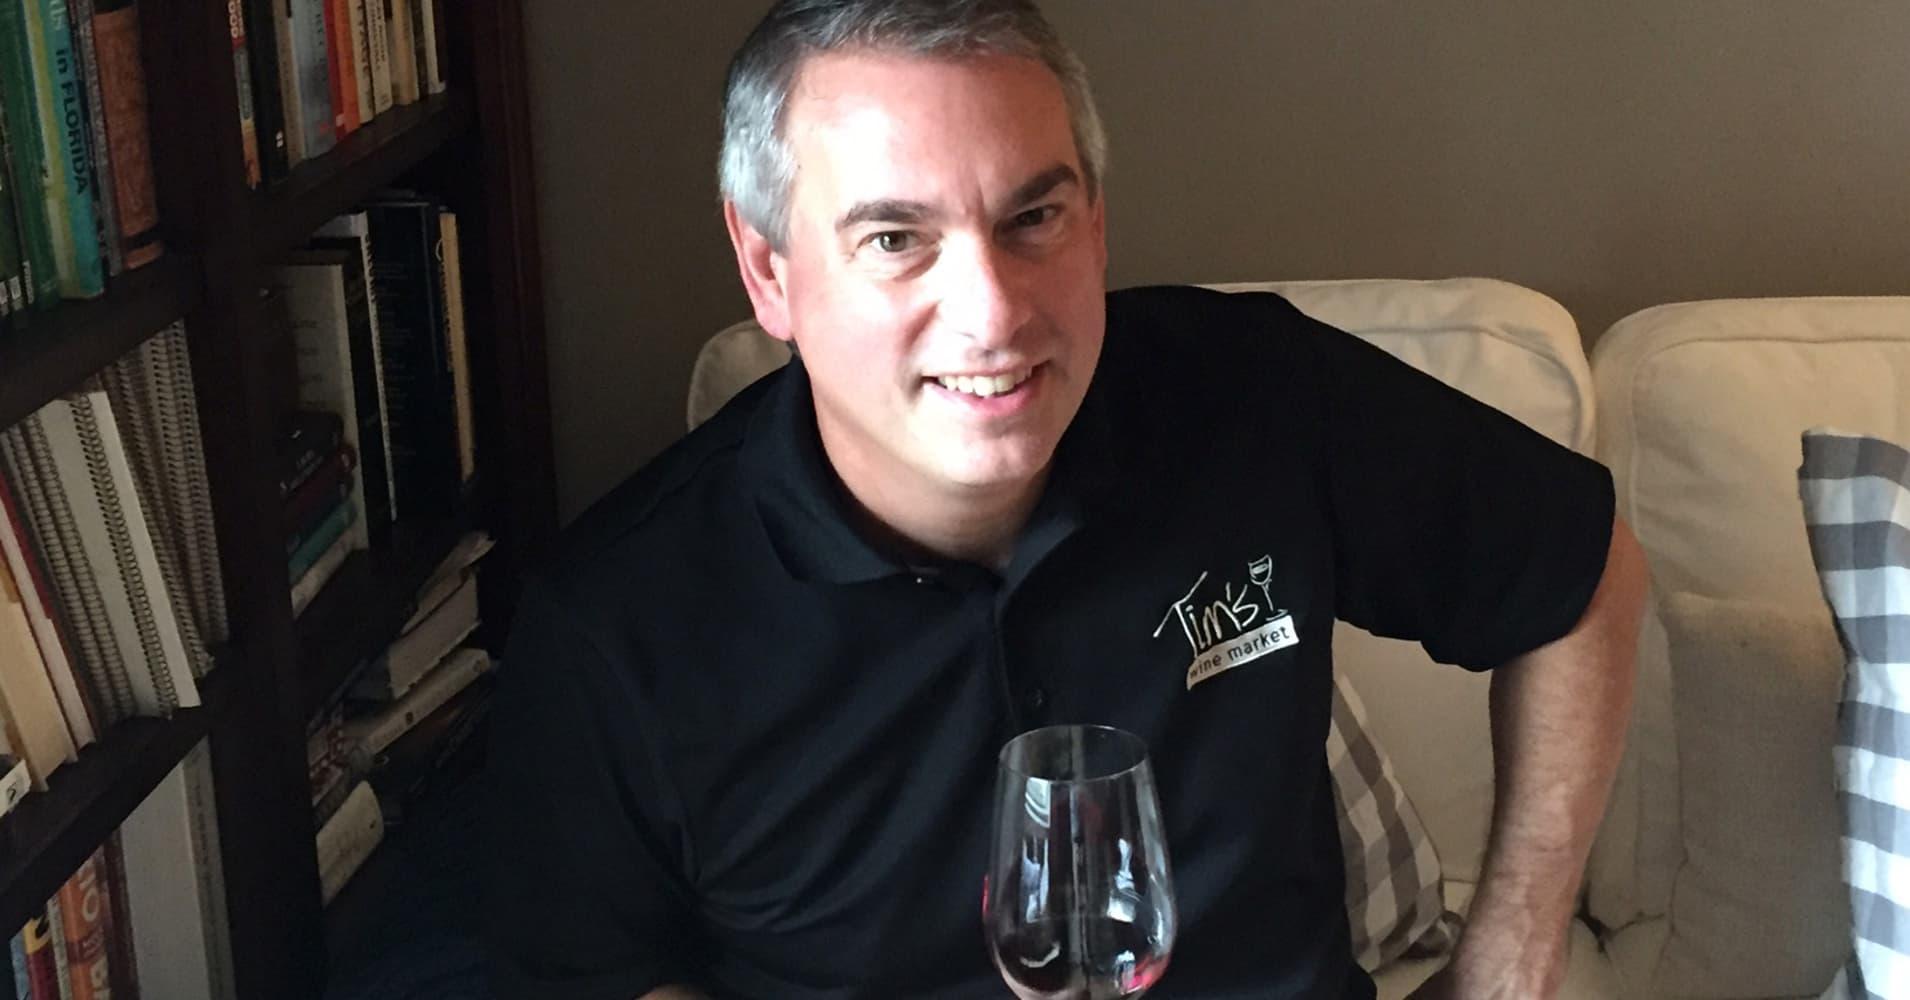 Wine seller Tim Varan in Orlando, Florida has seen his sales spike in the wake of Hurricane Matthew.